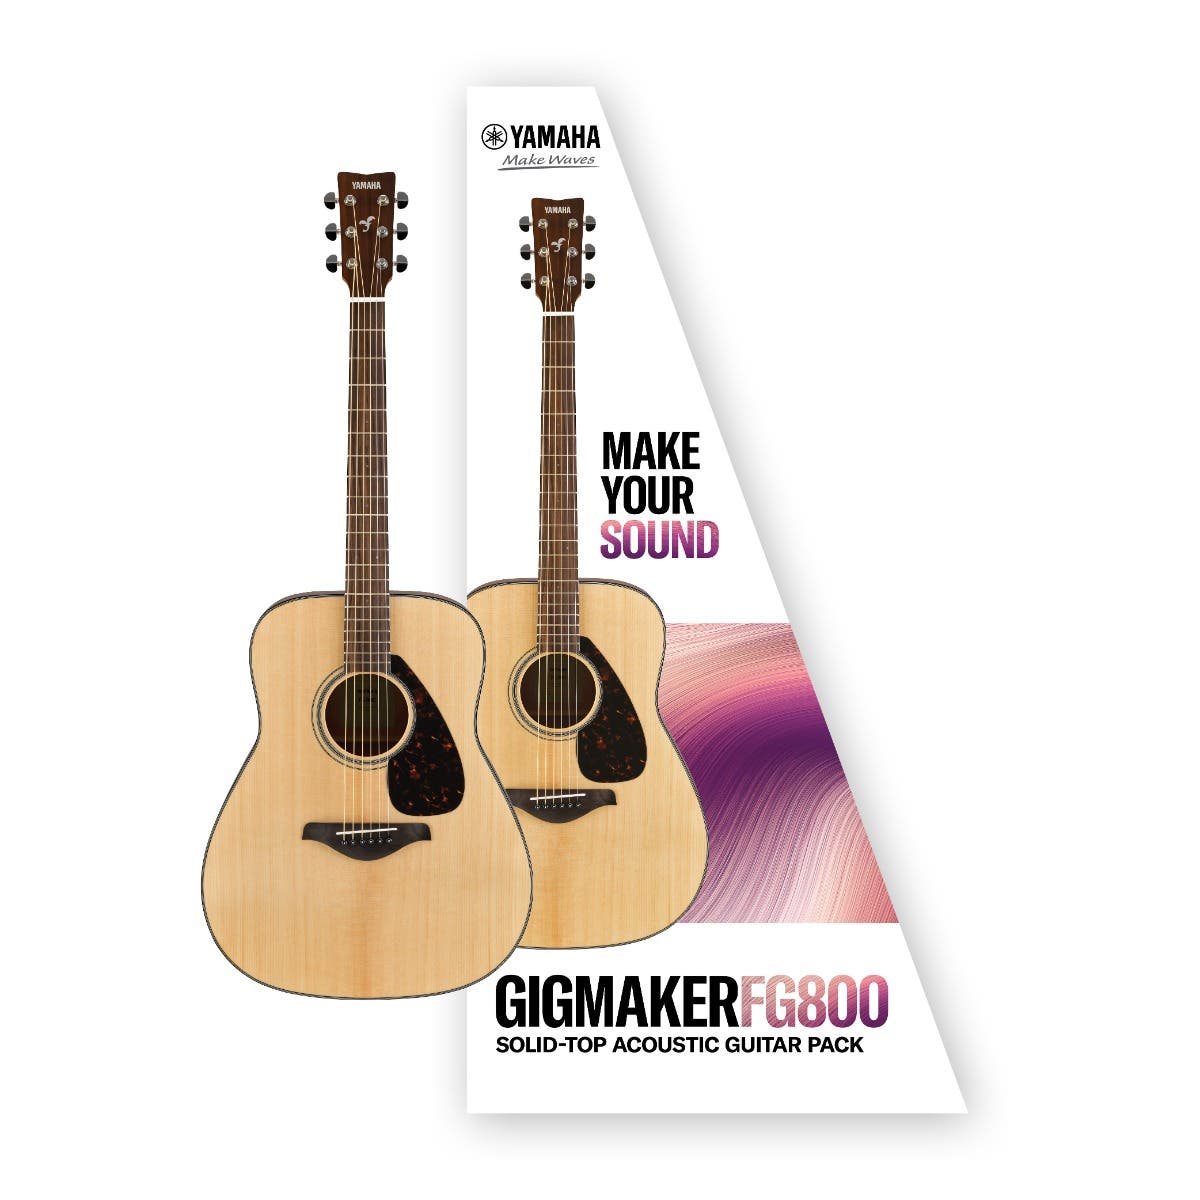 Yamaha FG800 Gigmaker Acoustic Guitar Value Pack - Matte Finish